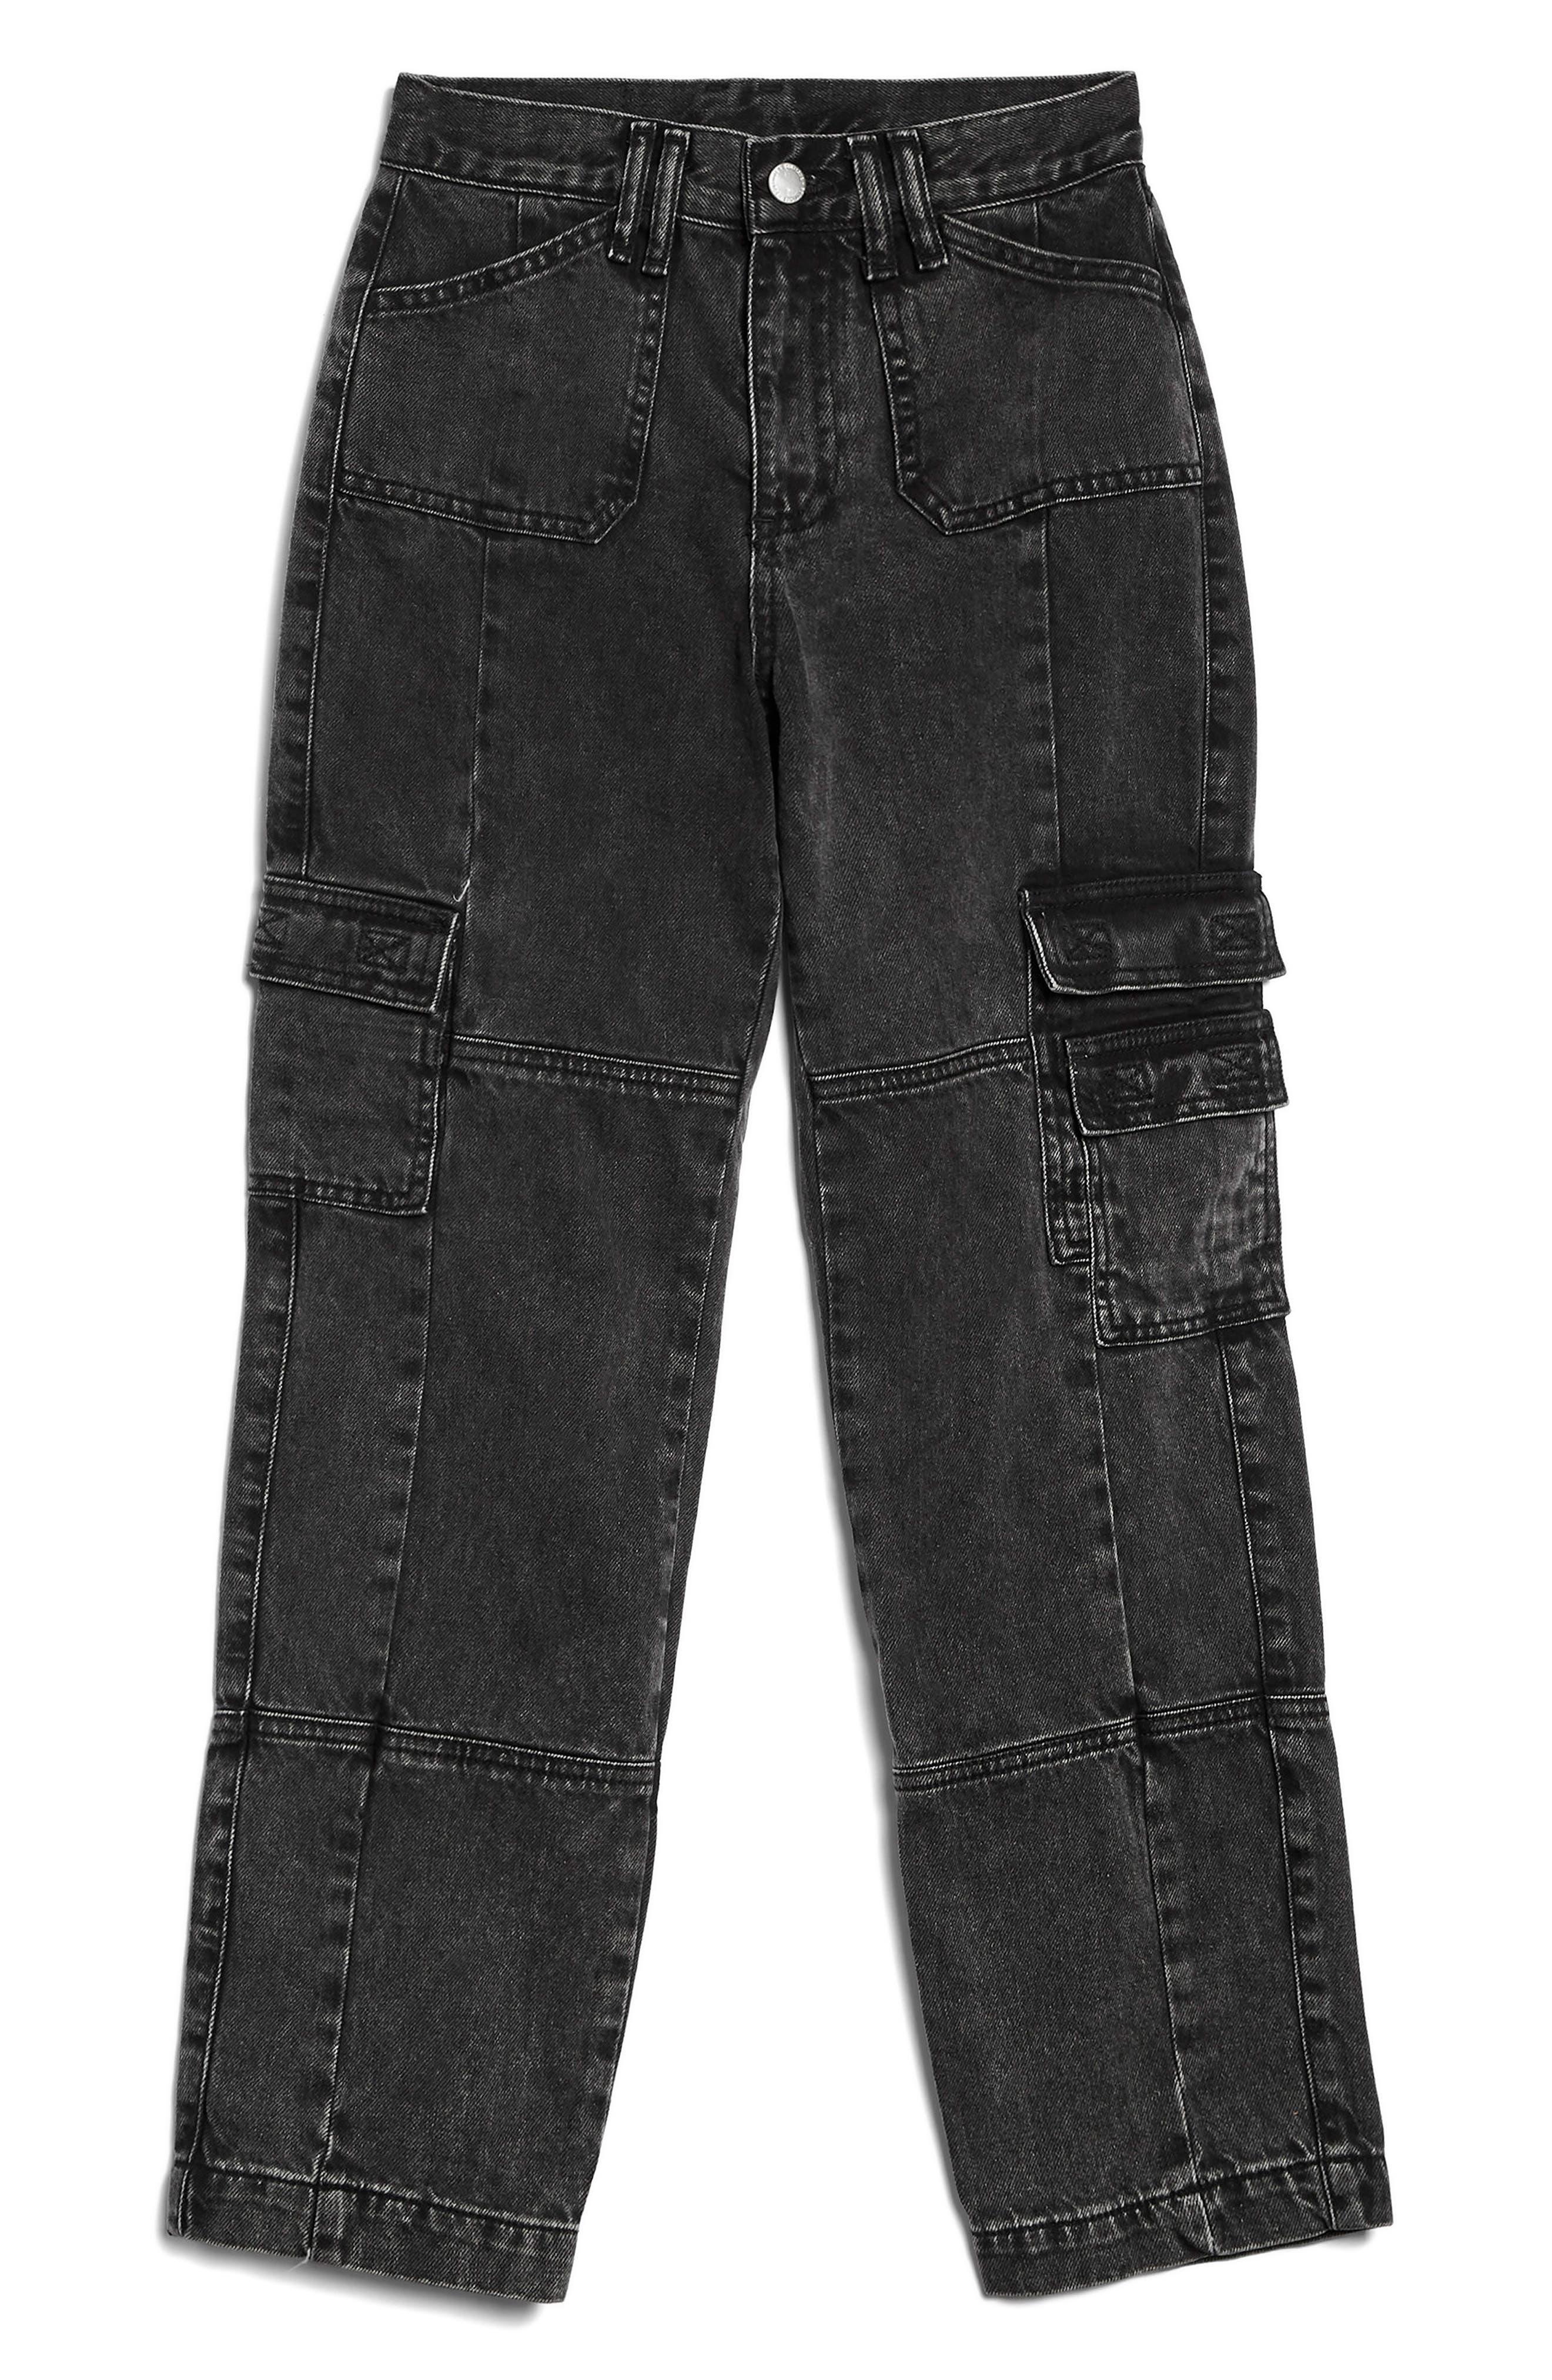 Washed Black Biker Jeans,                             Main thumbnail 1, color,                             003